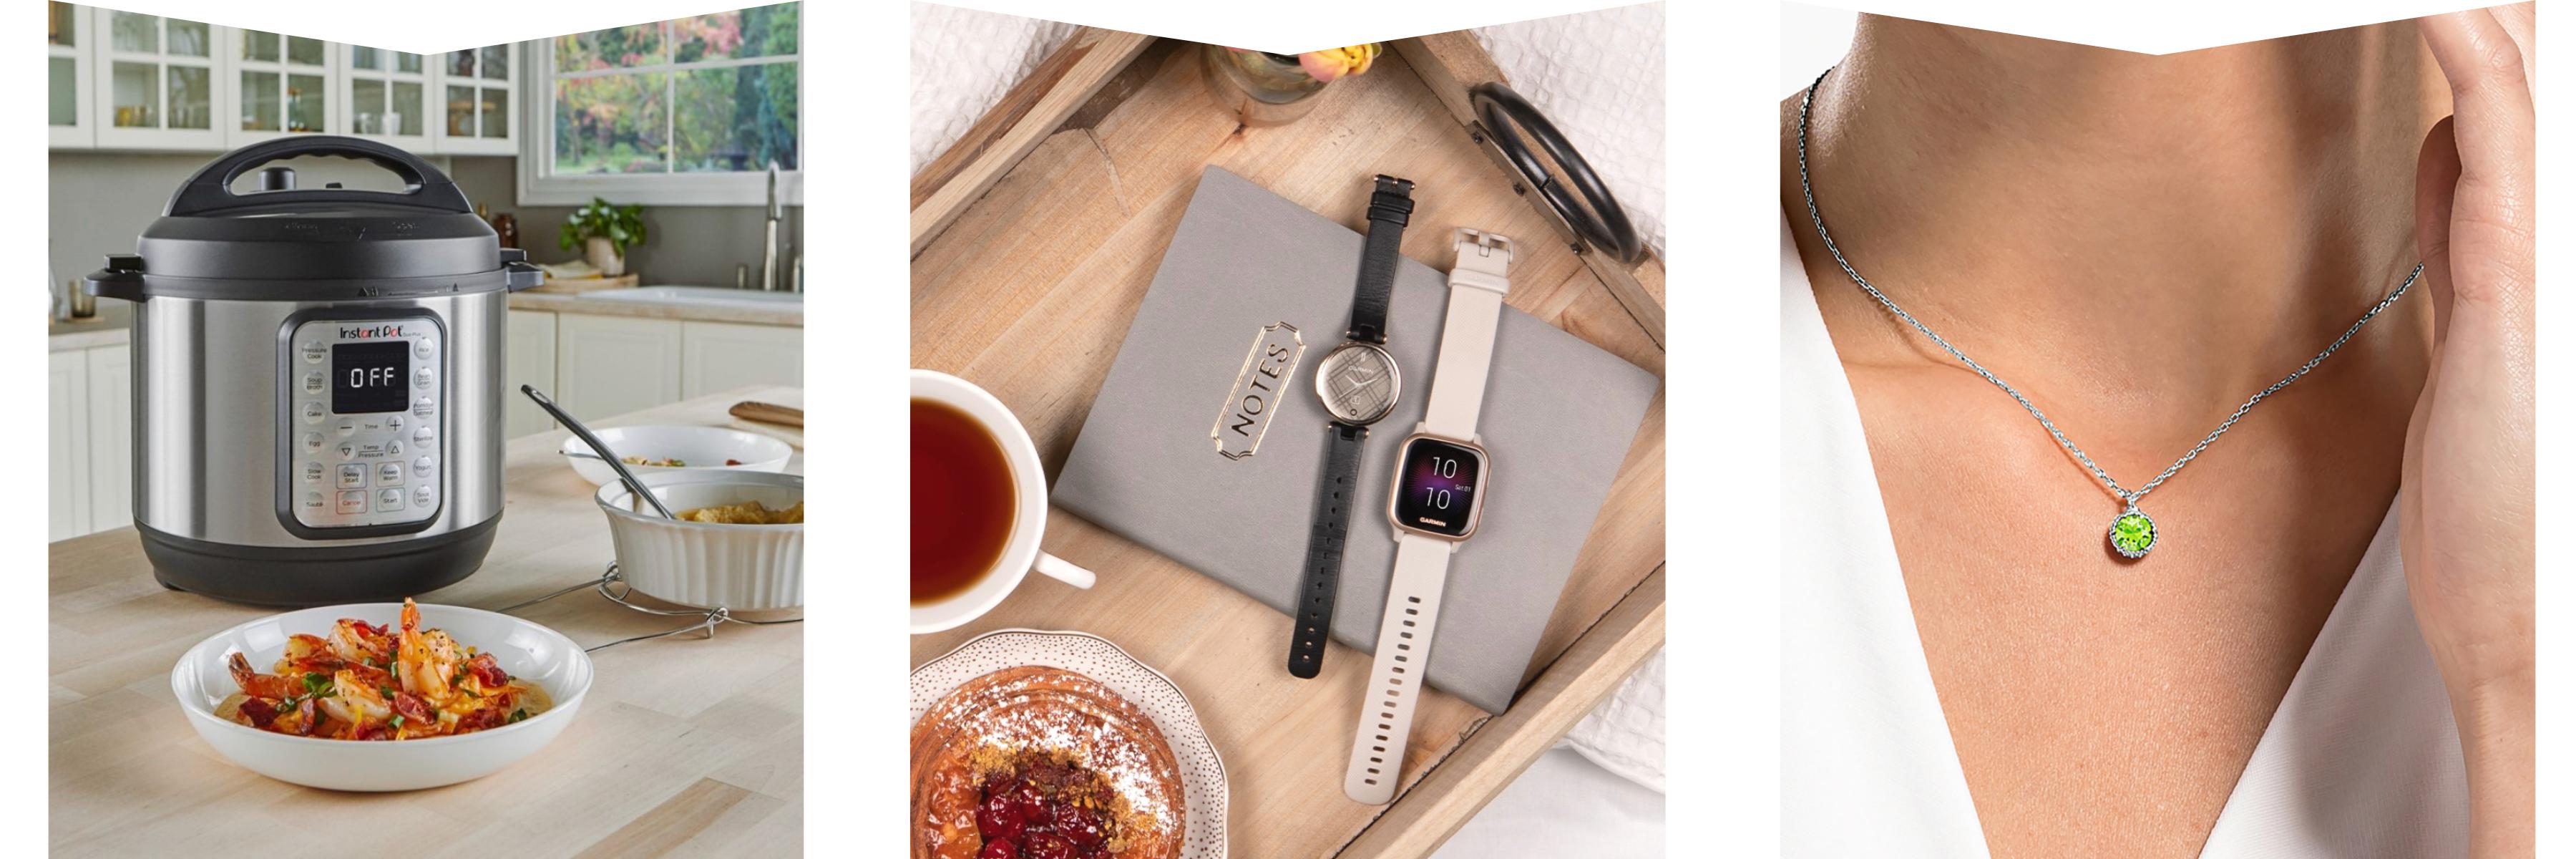 Instant pot, smart watch & jewellery